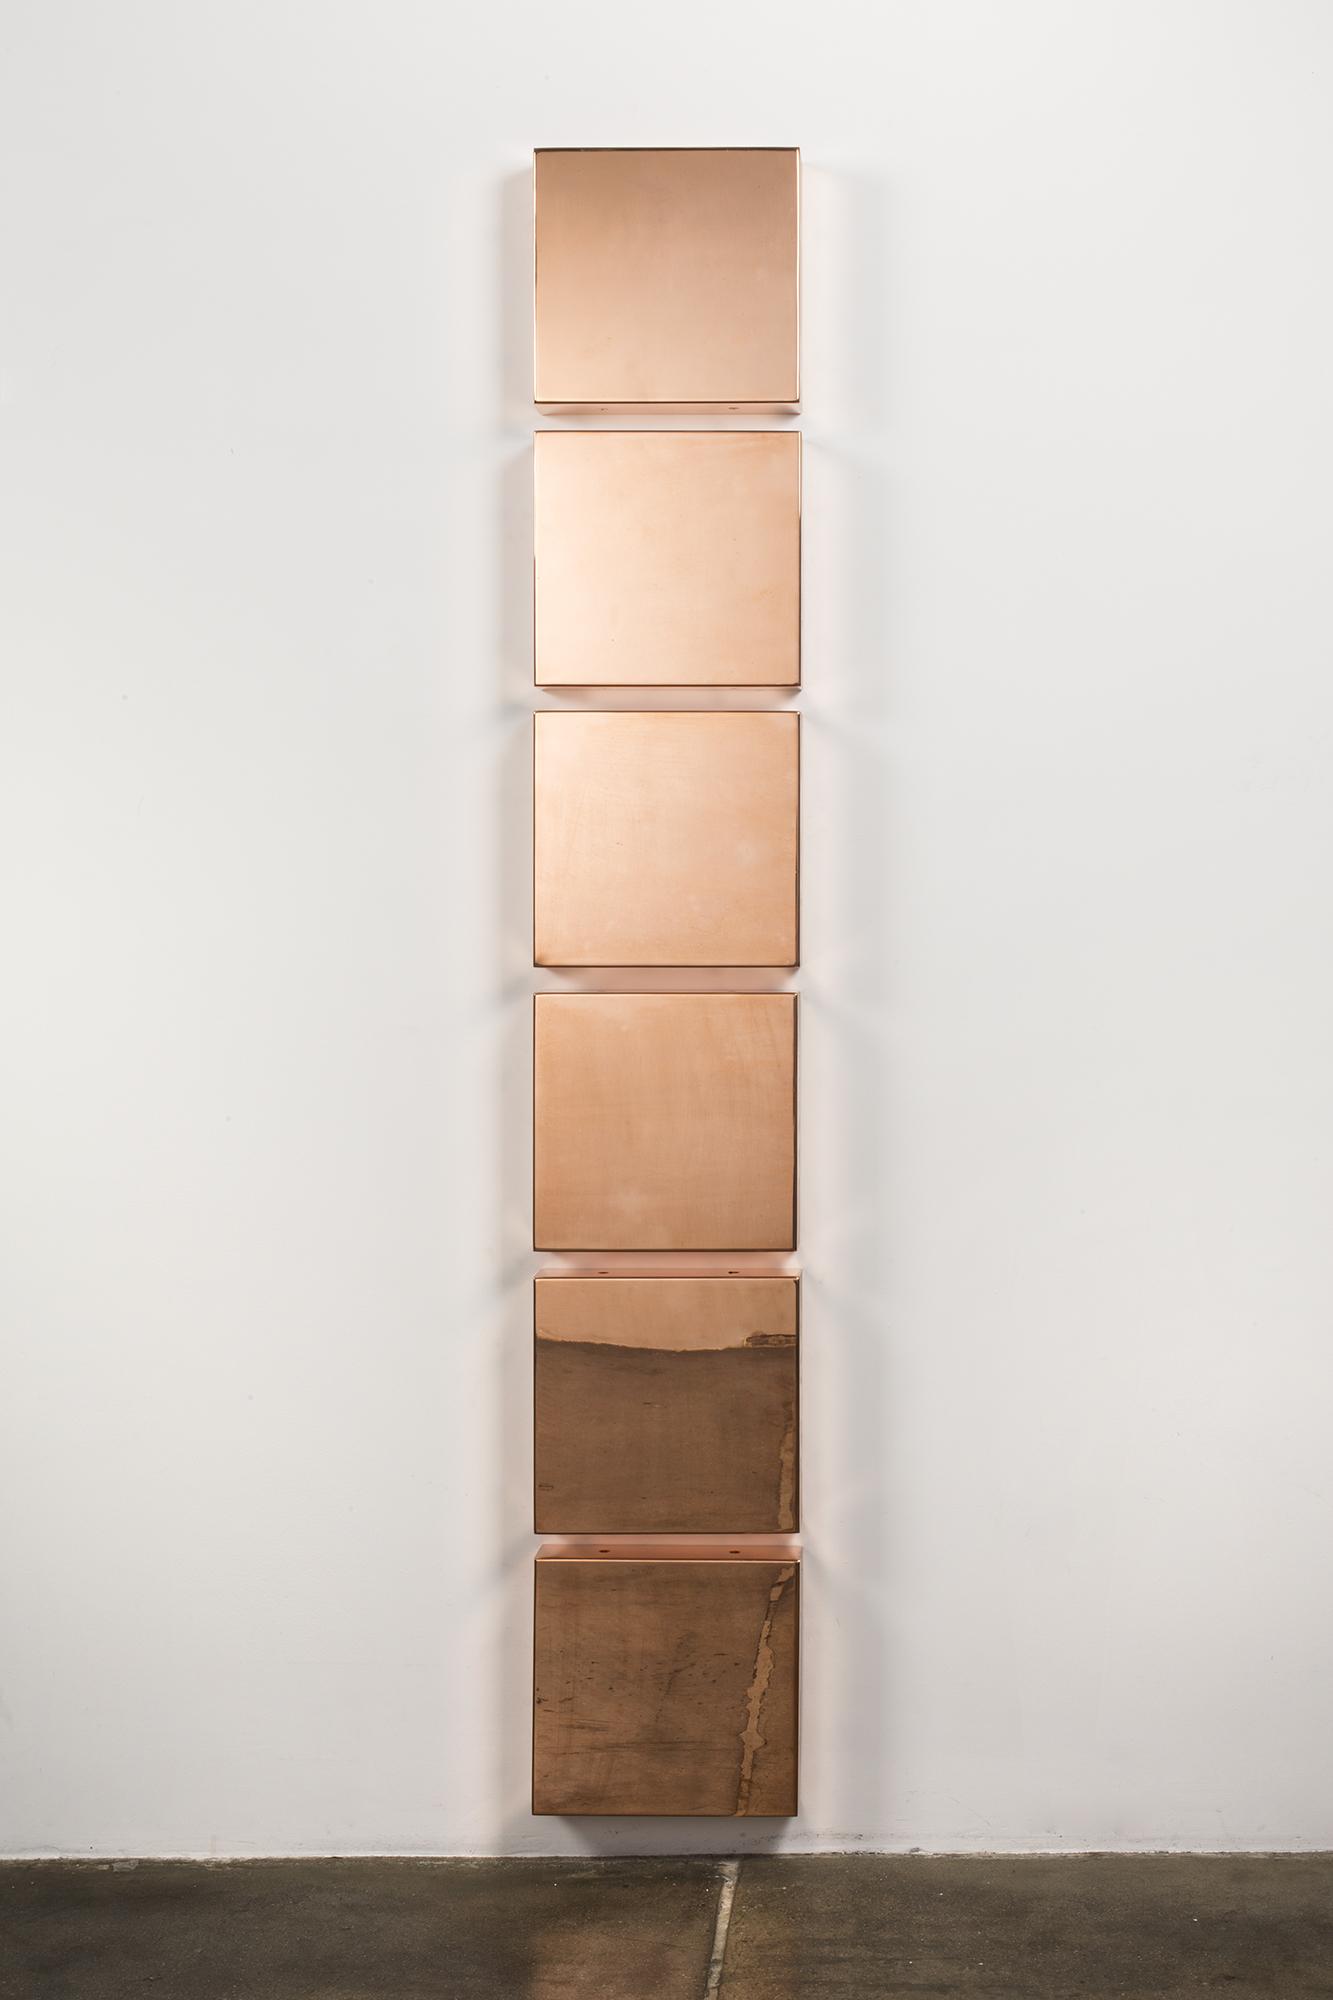 Copper Surrogate (48 ounce C11000 Copper Alloy: June 14, 2016, Basel, Switzerland; November 22, 2016, Miami, Florida)   2015  Polished copper  10 x 10 x 2 1/2 inches each, 6 parts   Surrogates (Modular, Art Handling), 2014–